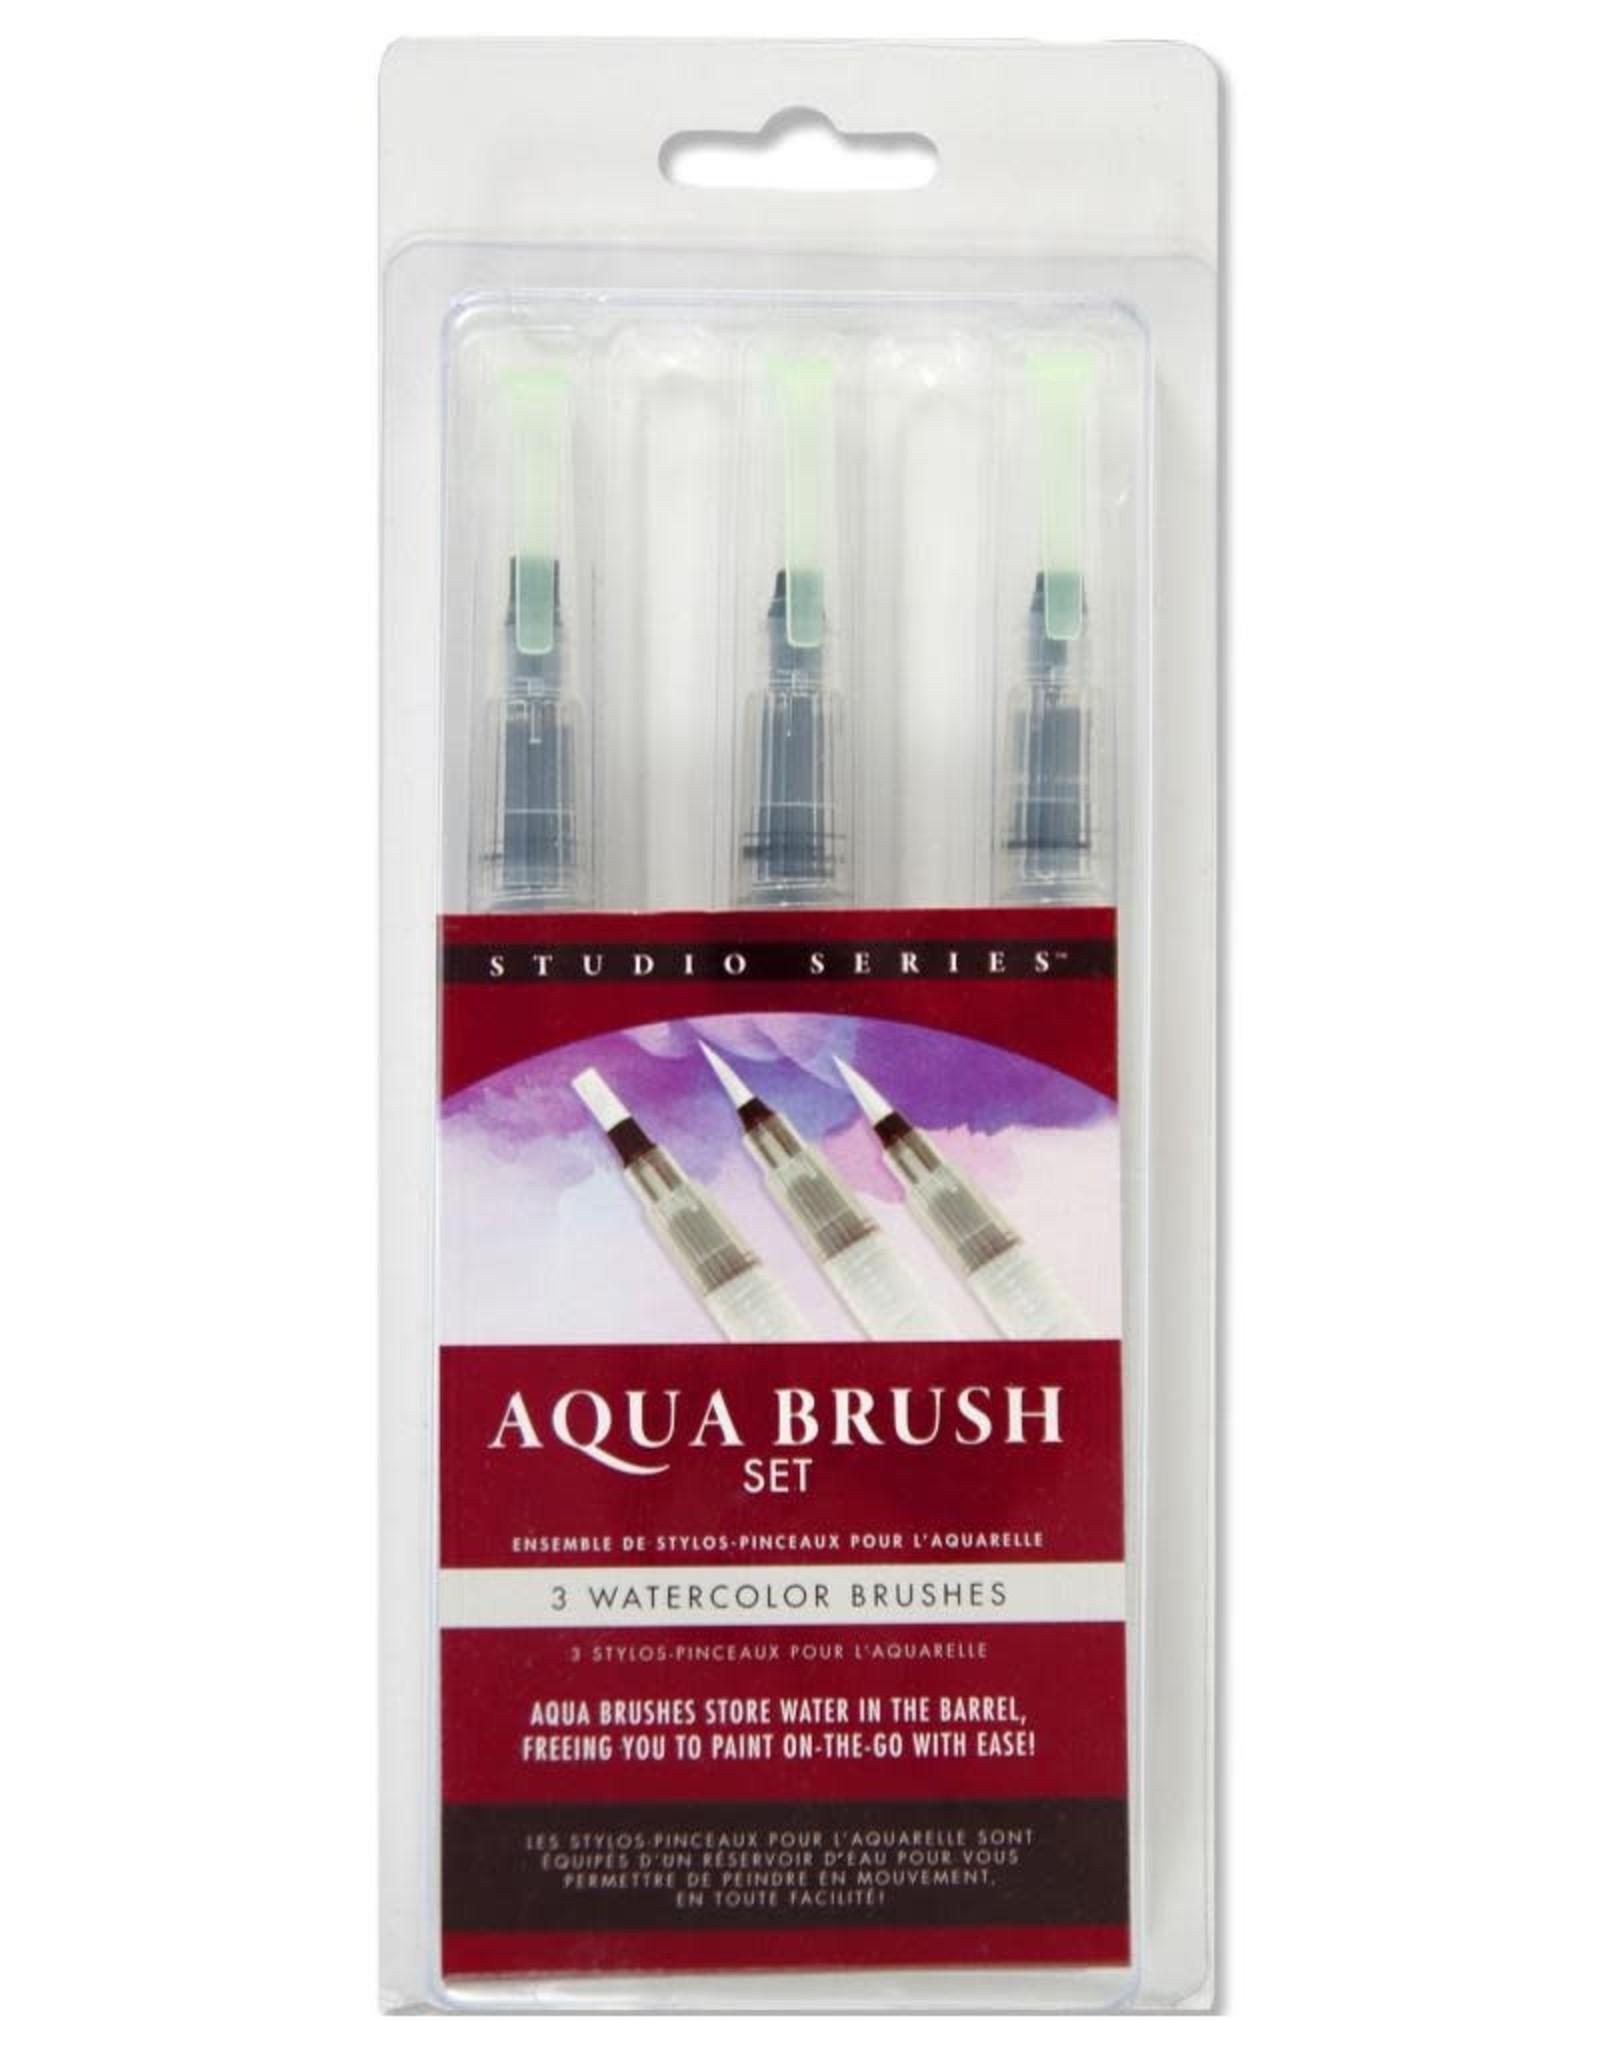 Peter Pauper Aqua Brush Set